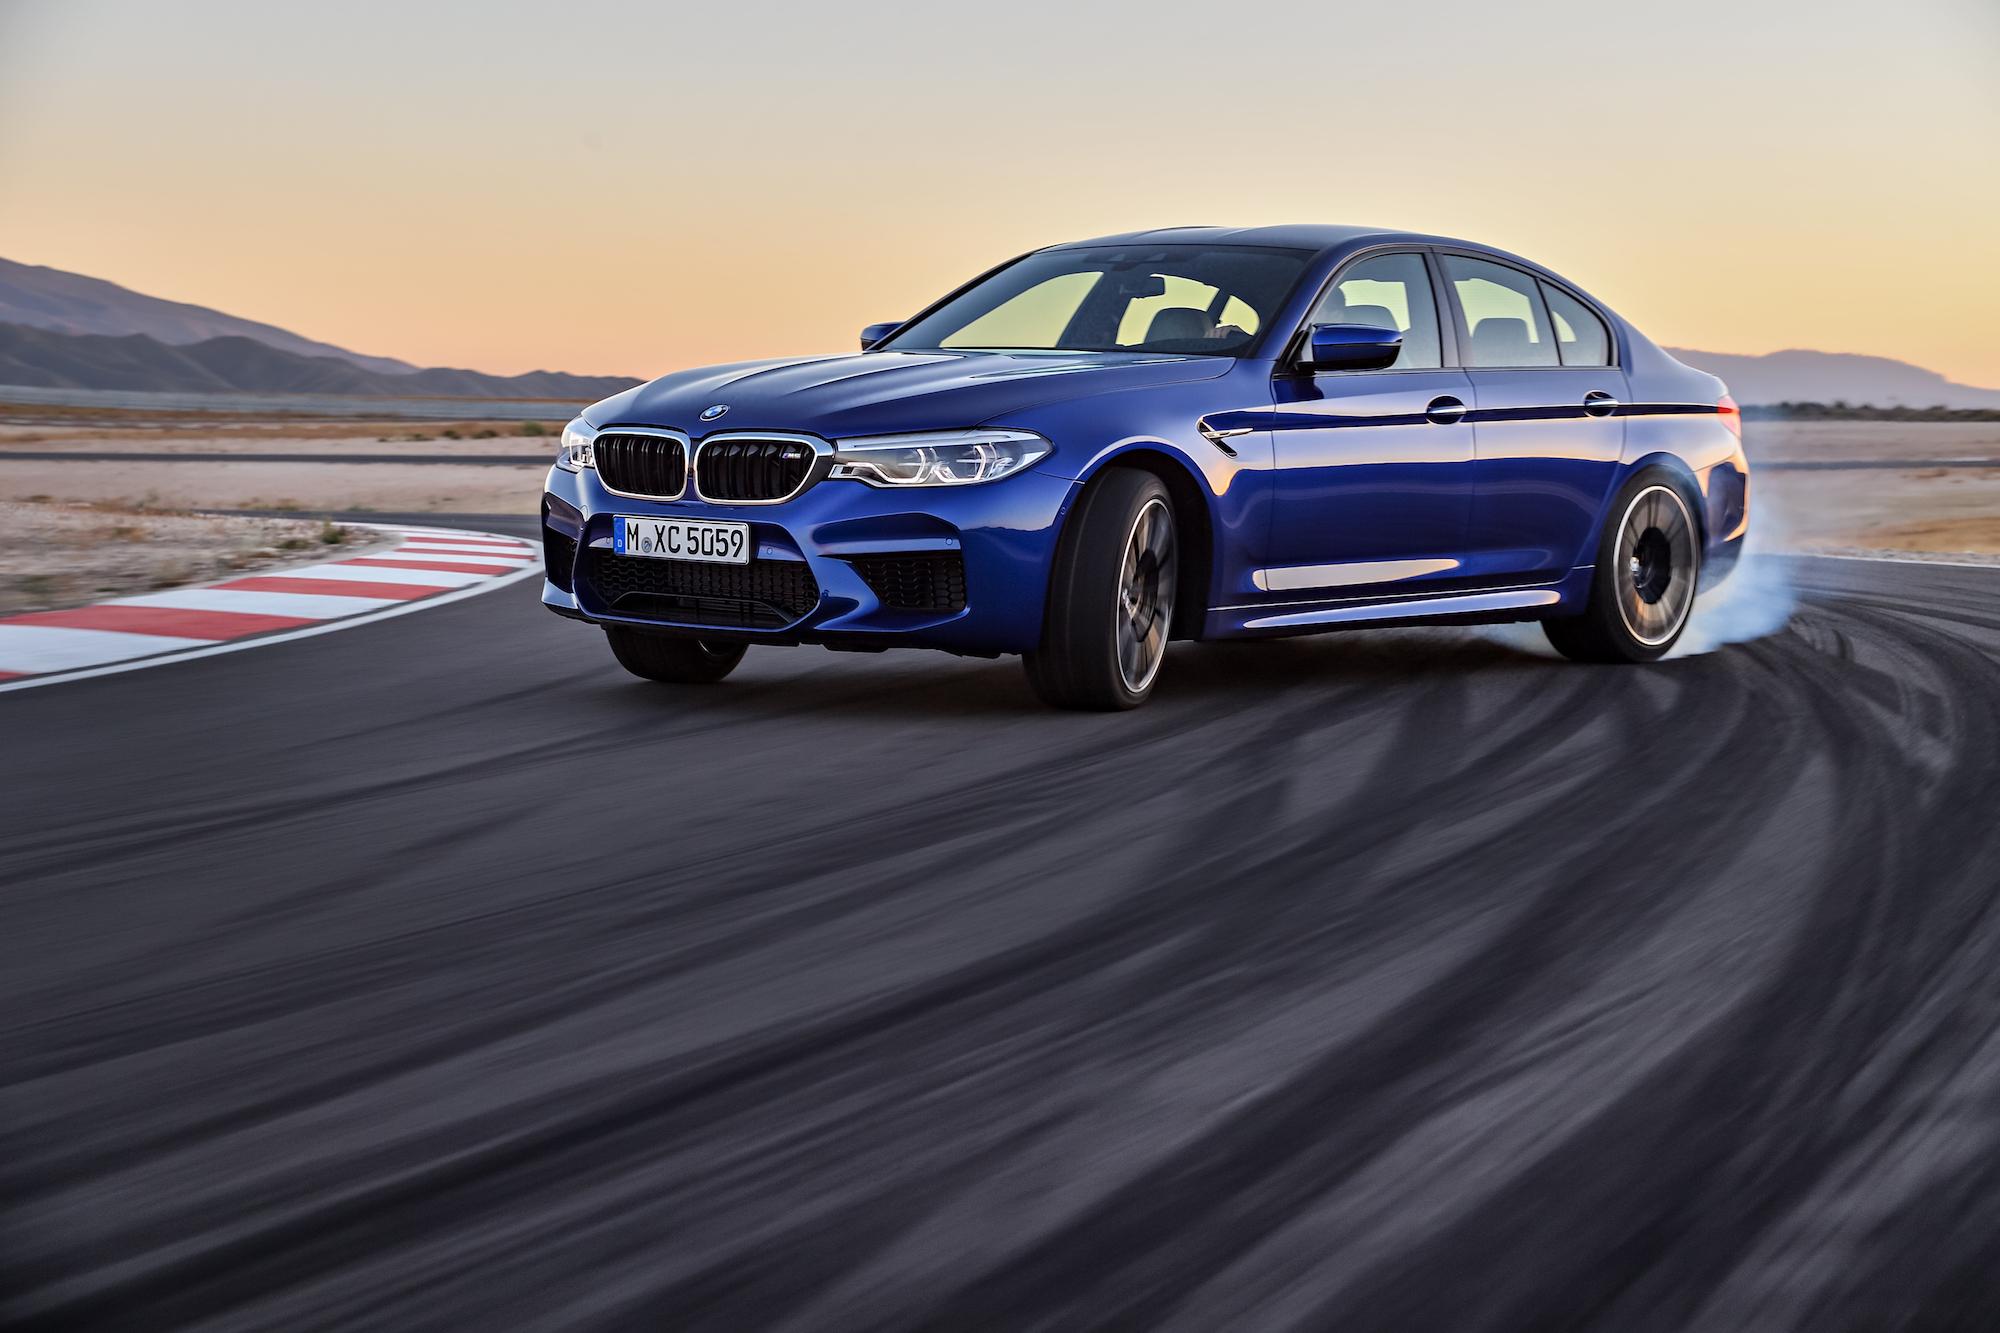 New BMW 2018 models